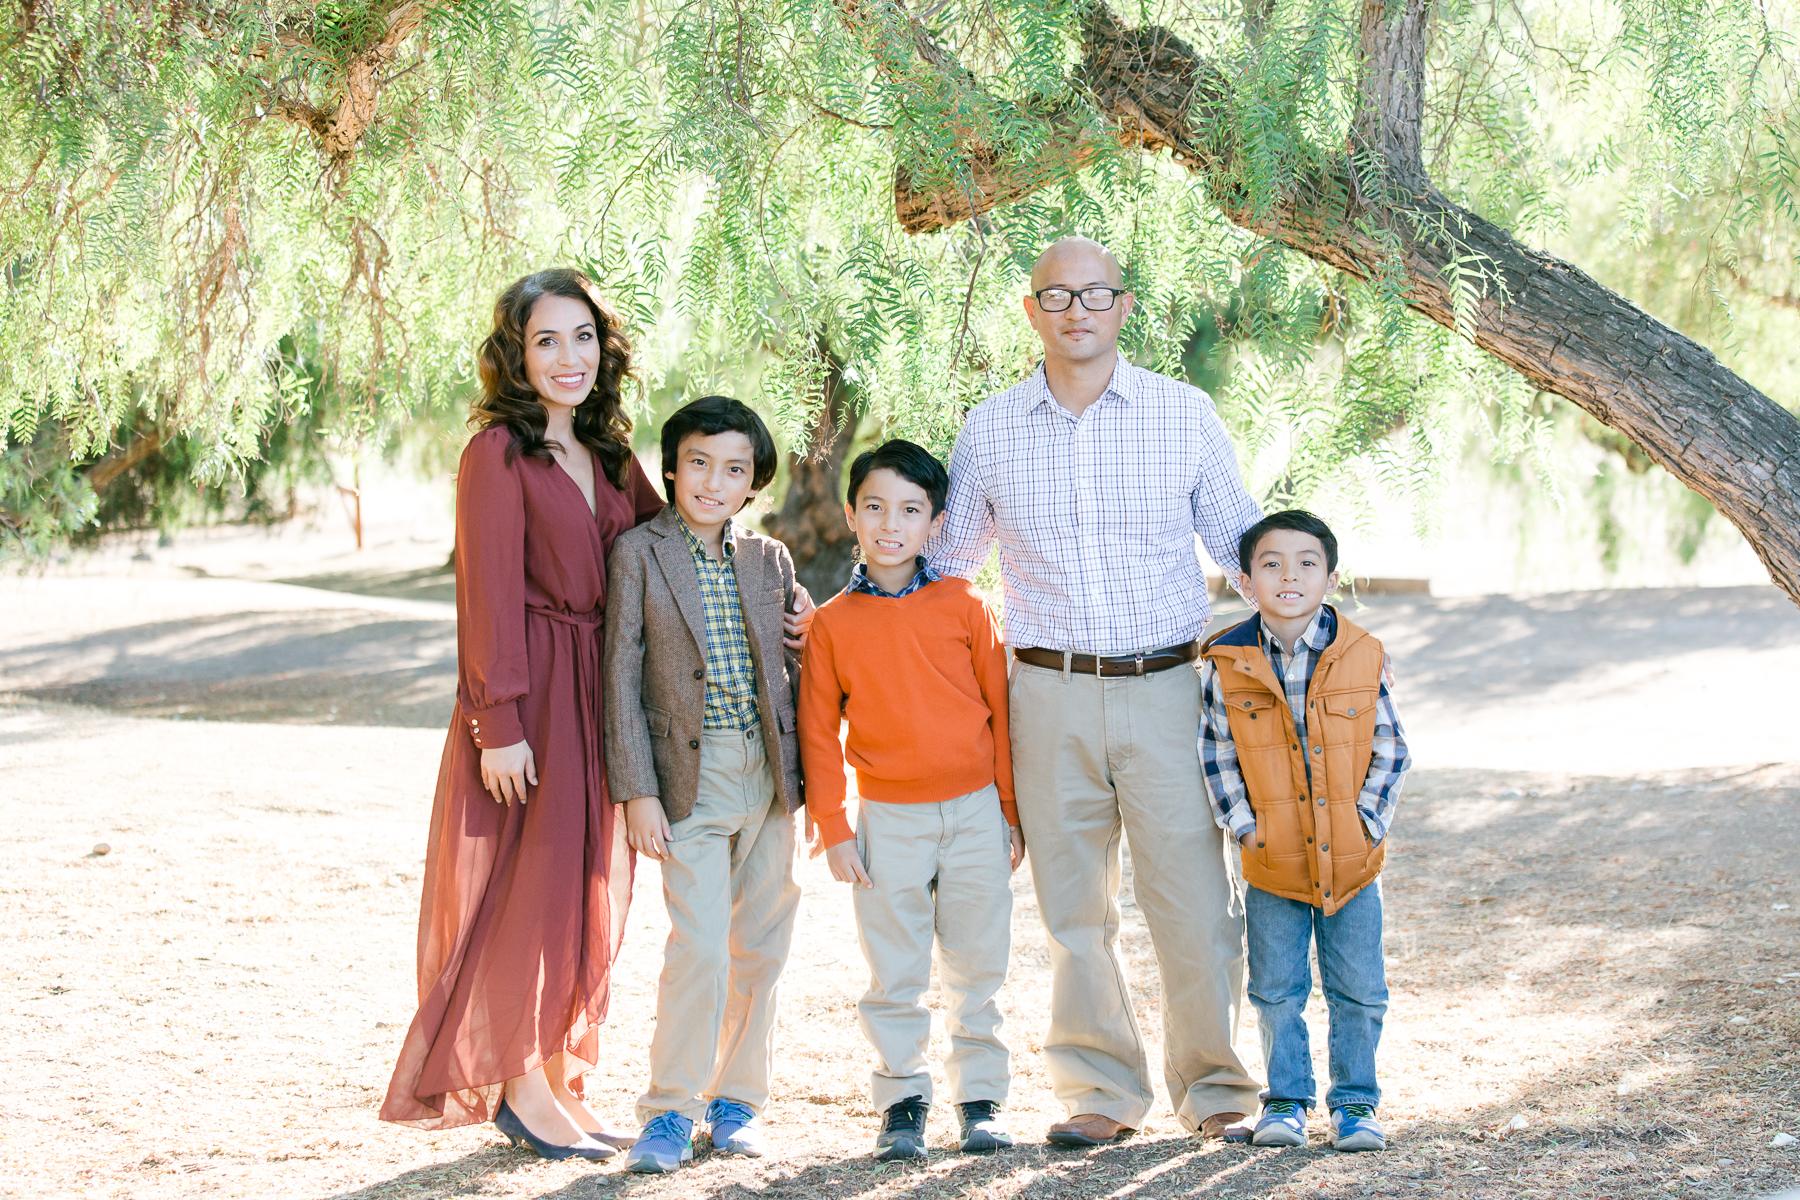 NEMA Photo I.Knightly011 - The Almodovar Family | Los Penasquitos canyon preserve | San Diego Photographer